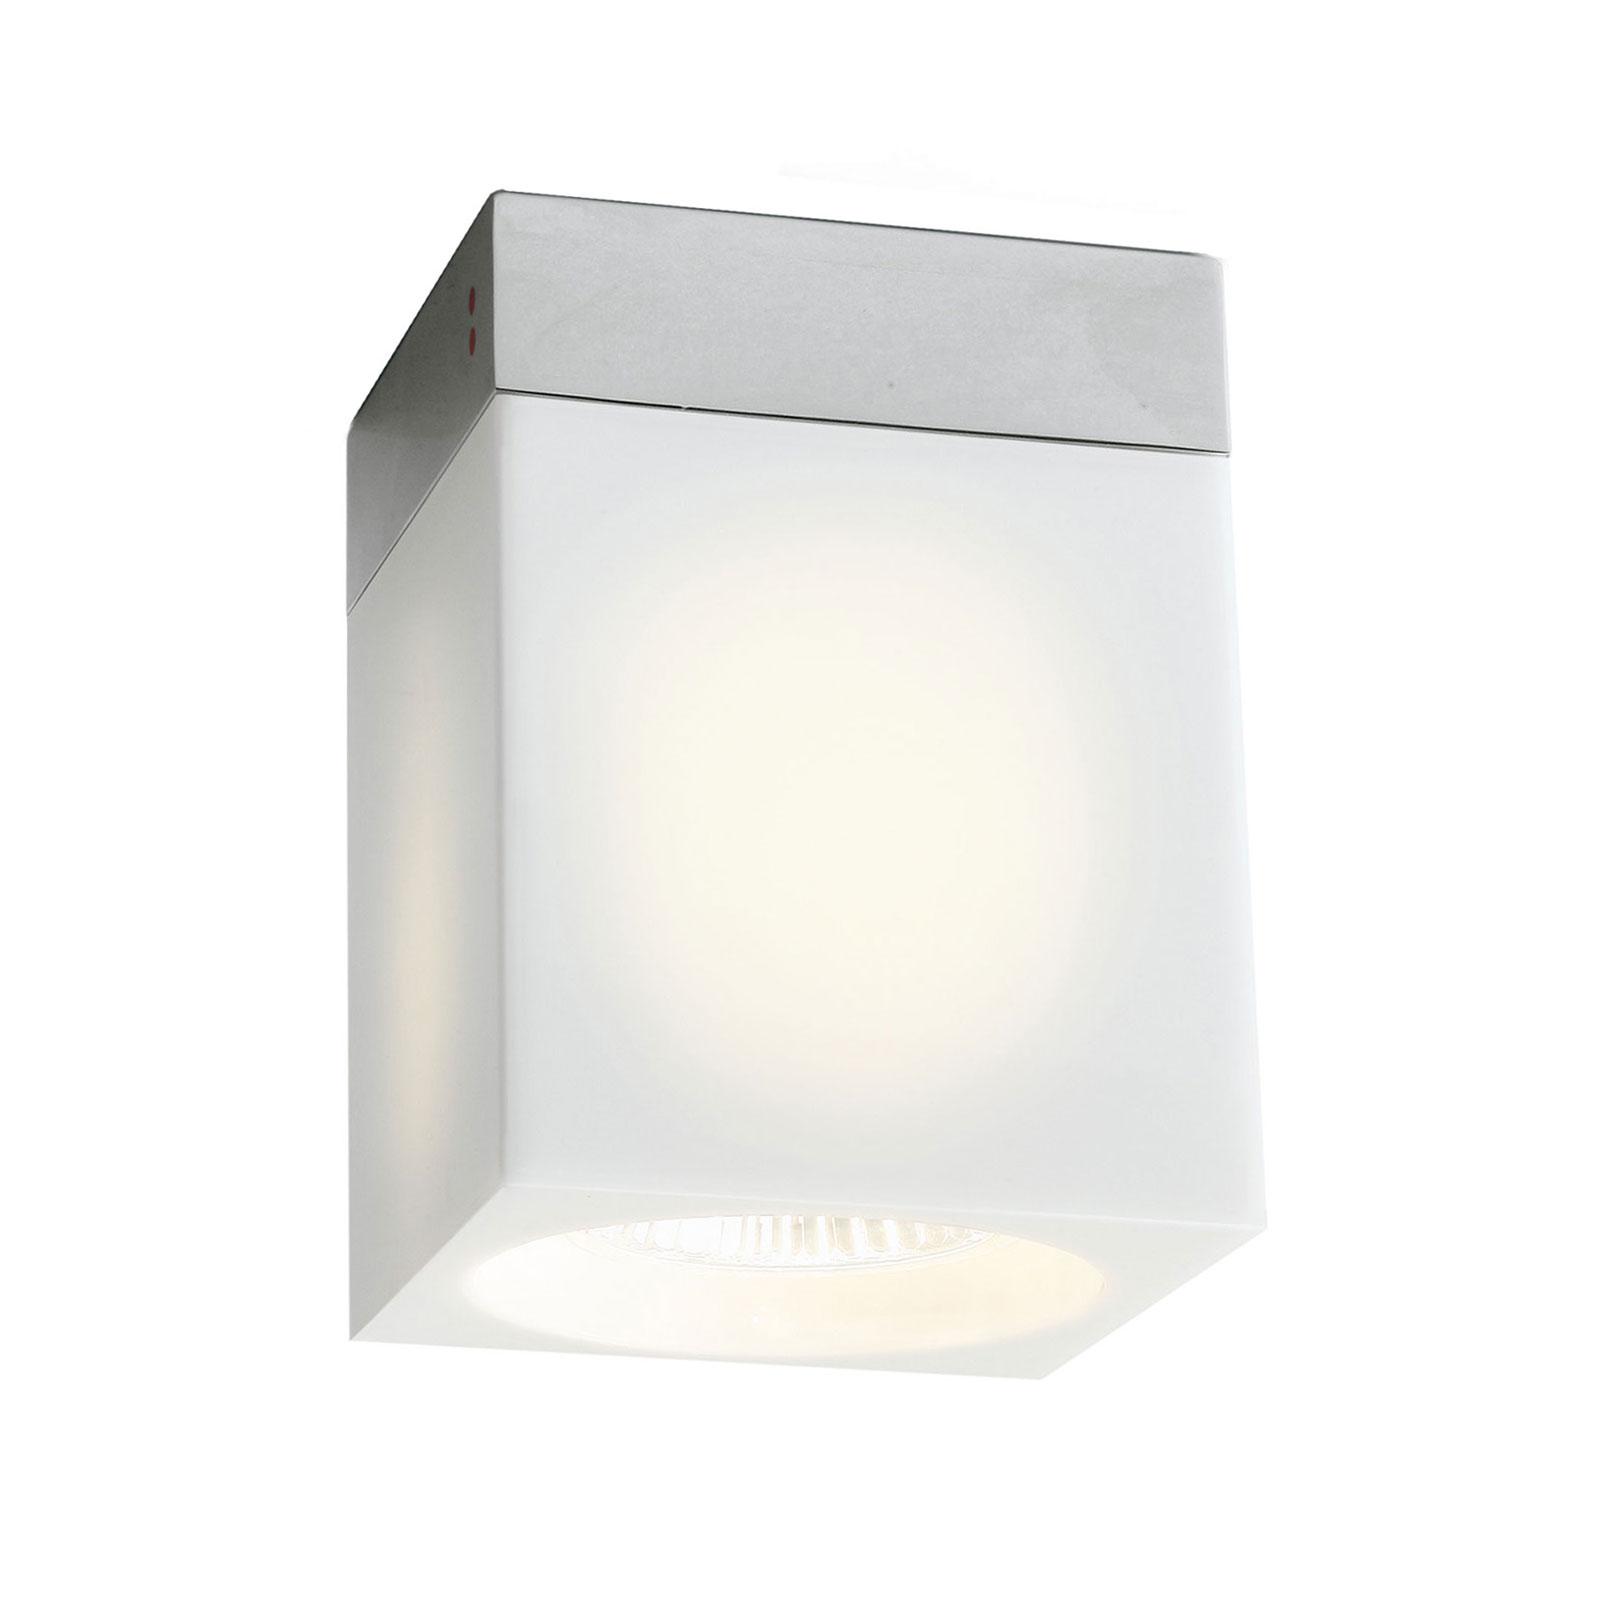 Cubetto plafondlamp 1-lamp, wit